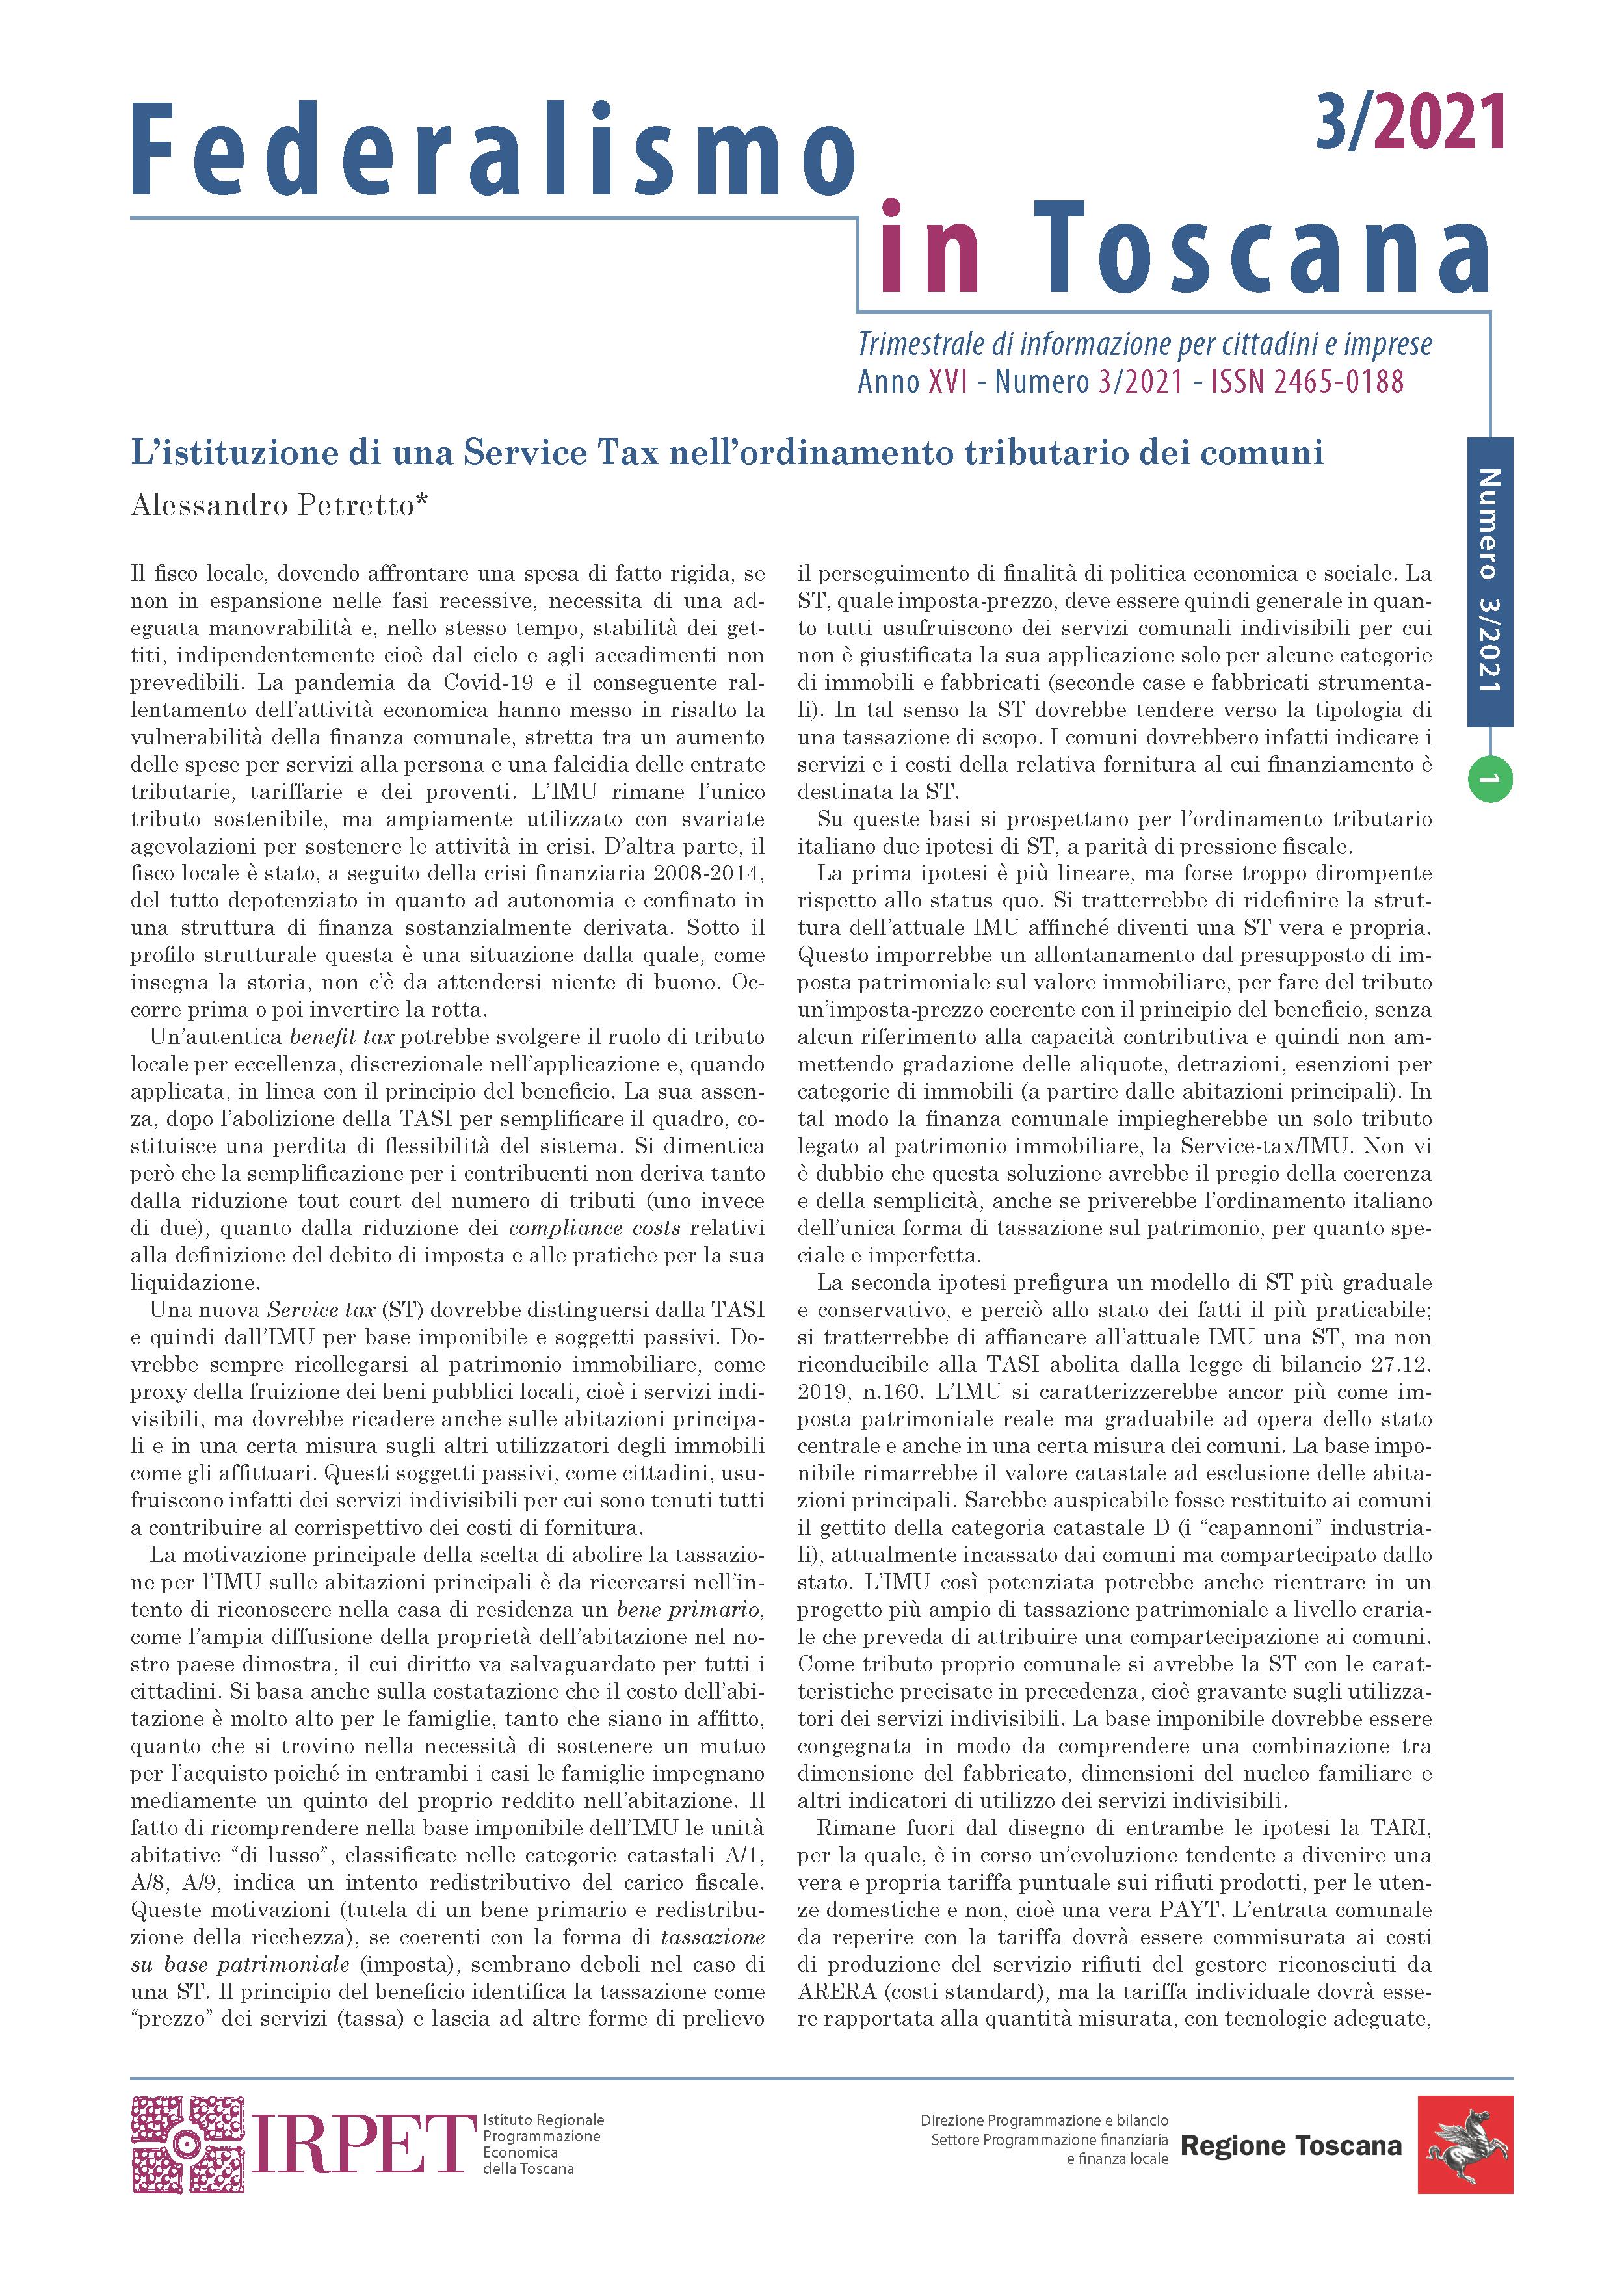 Federalismo in Toscana 3.2021